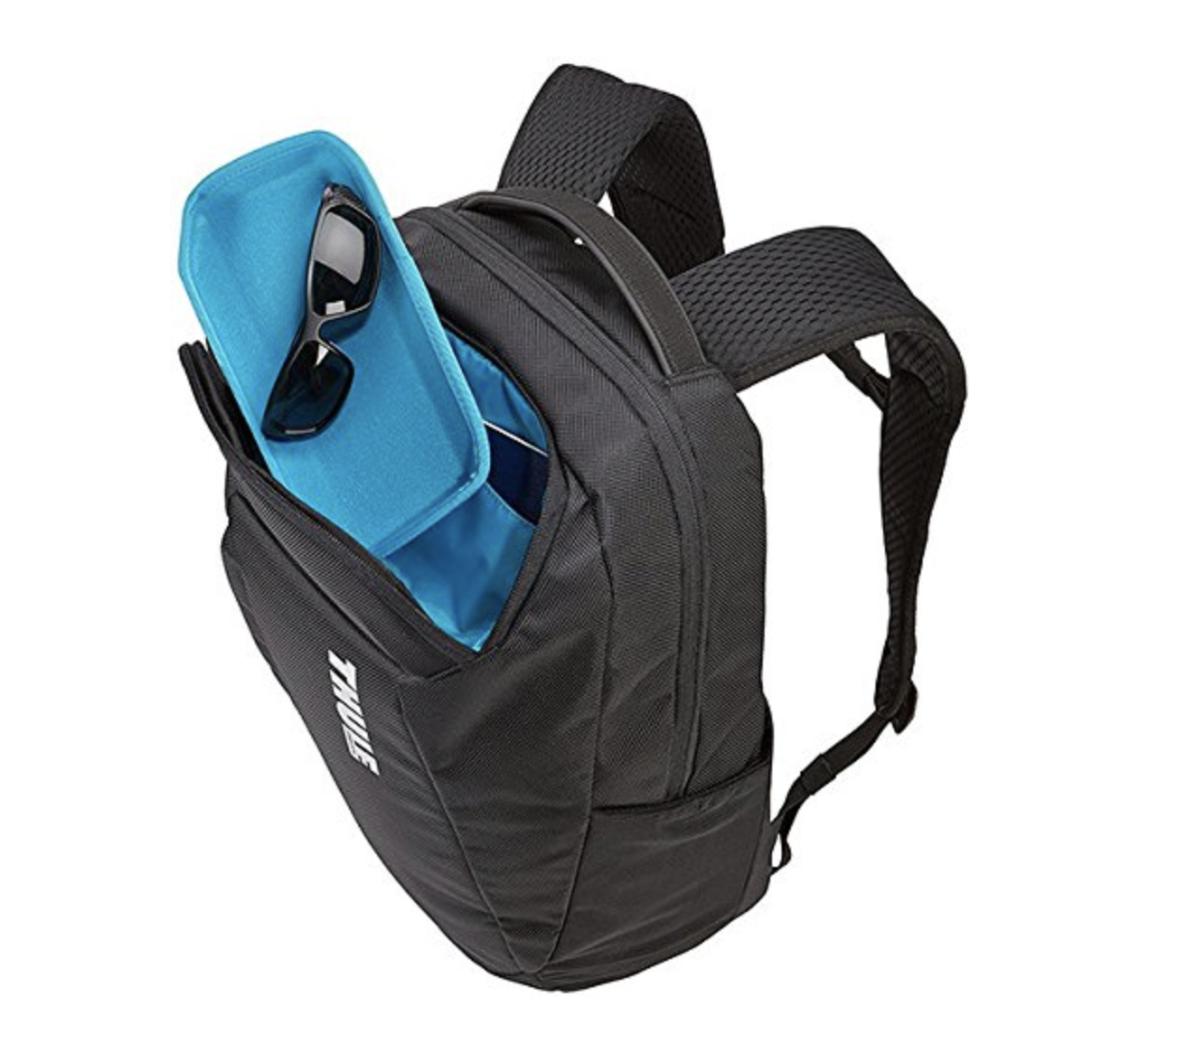 f:id:thebackpack:20190830192303p:plain